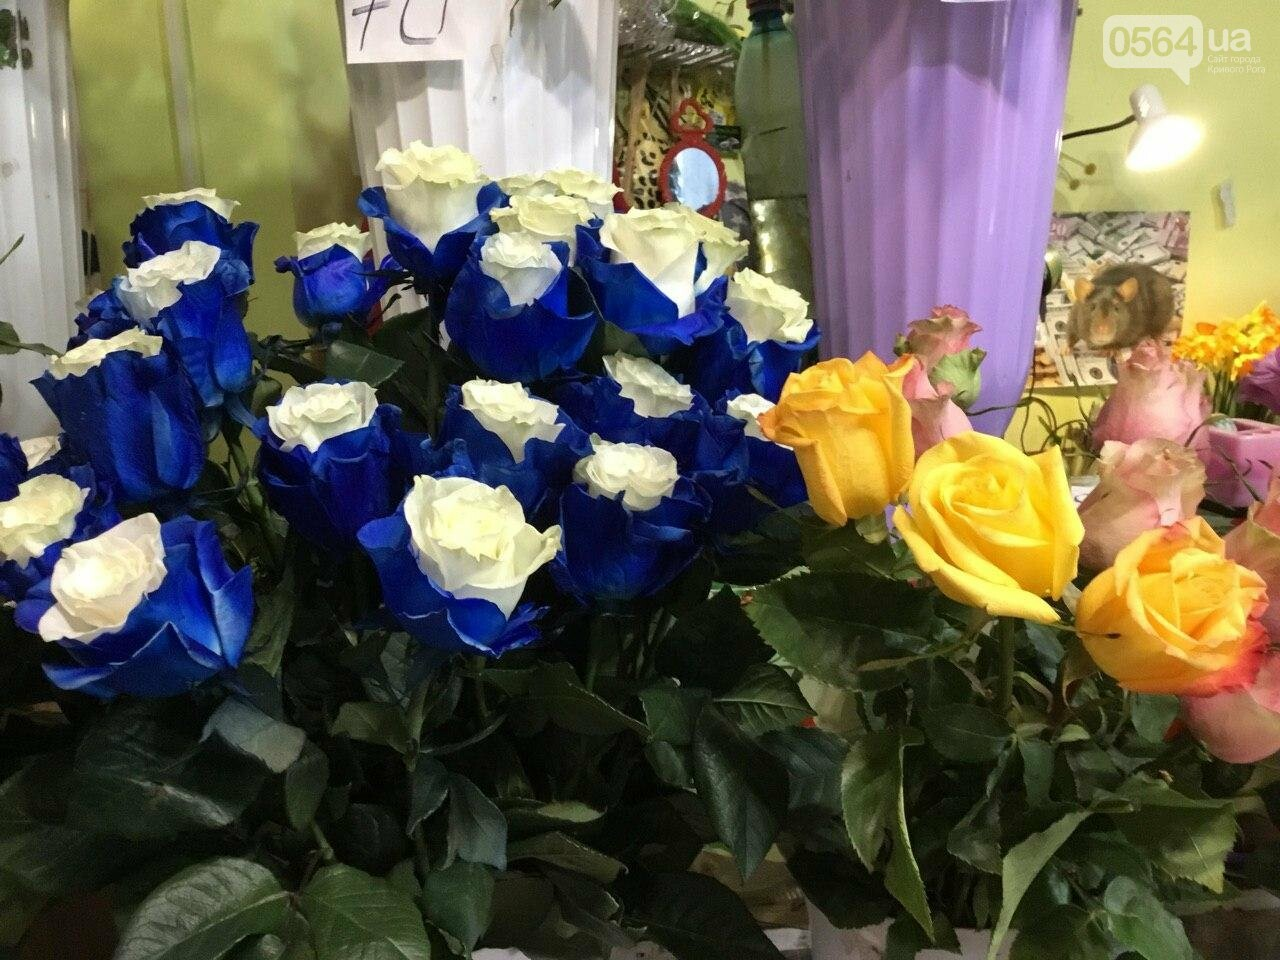 Сколько стоят примула, цикламен, мимоза? Обзор цен на цветы в Кривом Роге, - ФОТО, ВИДЕО, фото-9